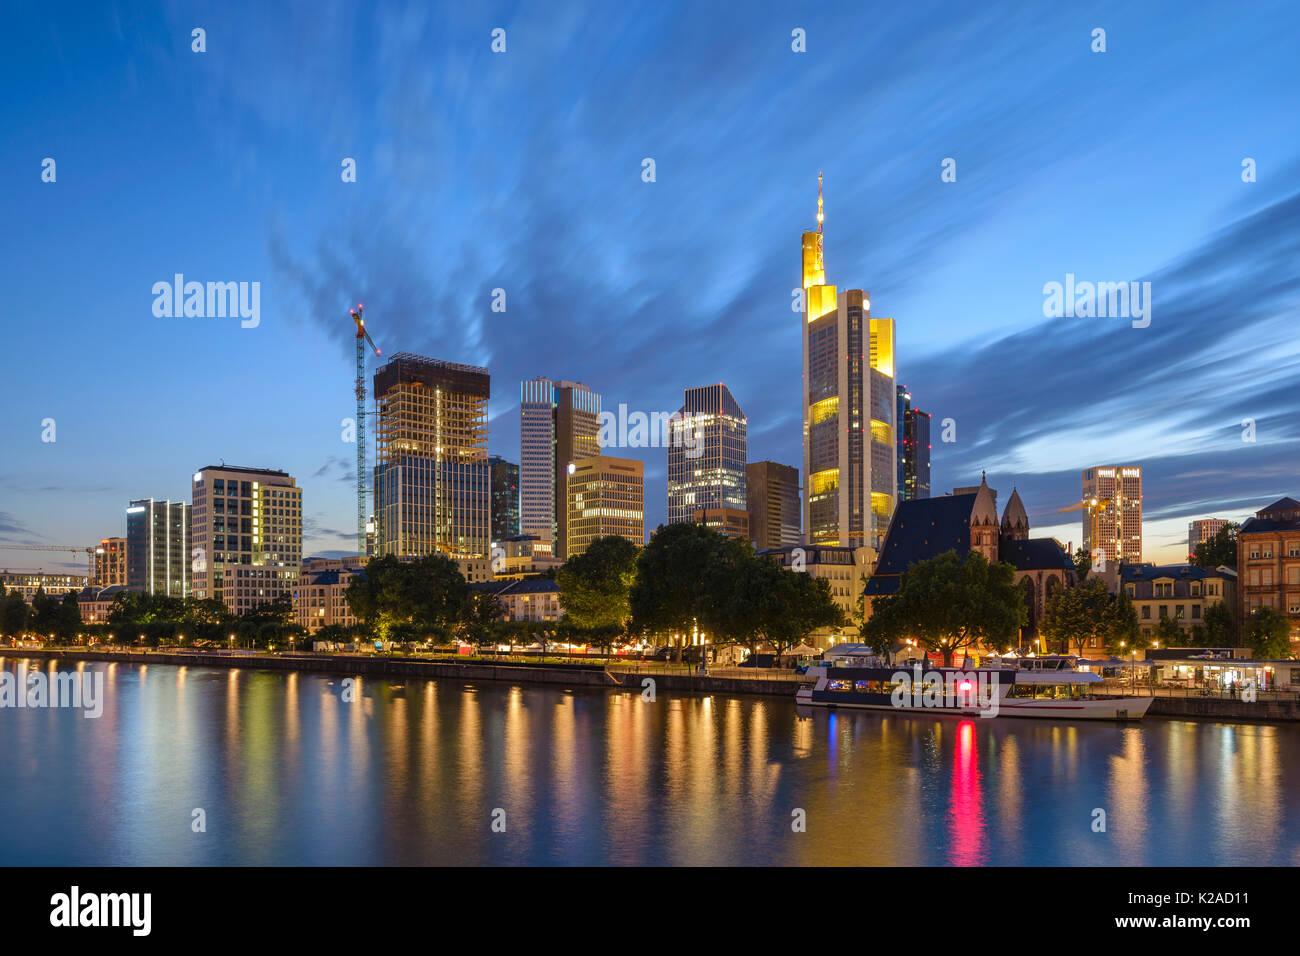 Frankfurt Night City Skyline bei Business District, Frankfurt, Deutschland Stockbild